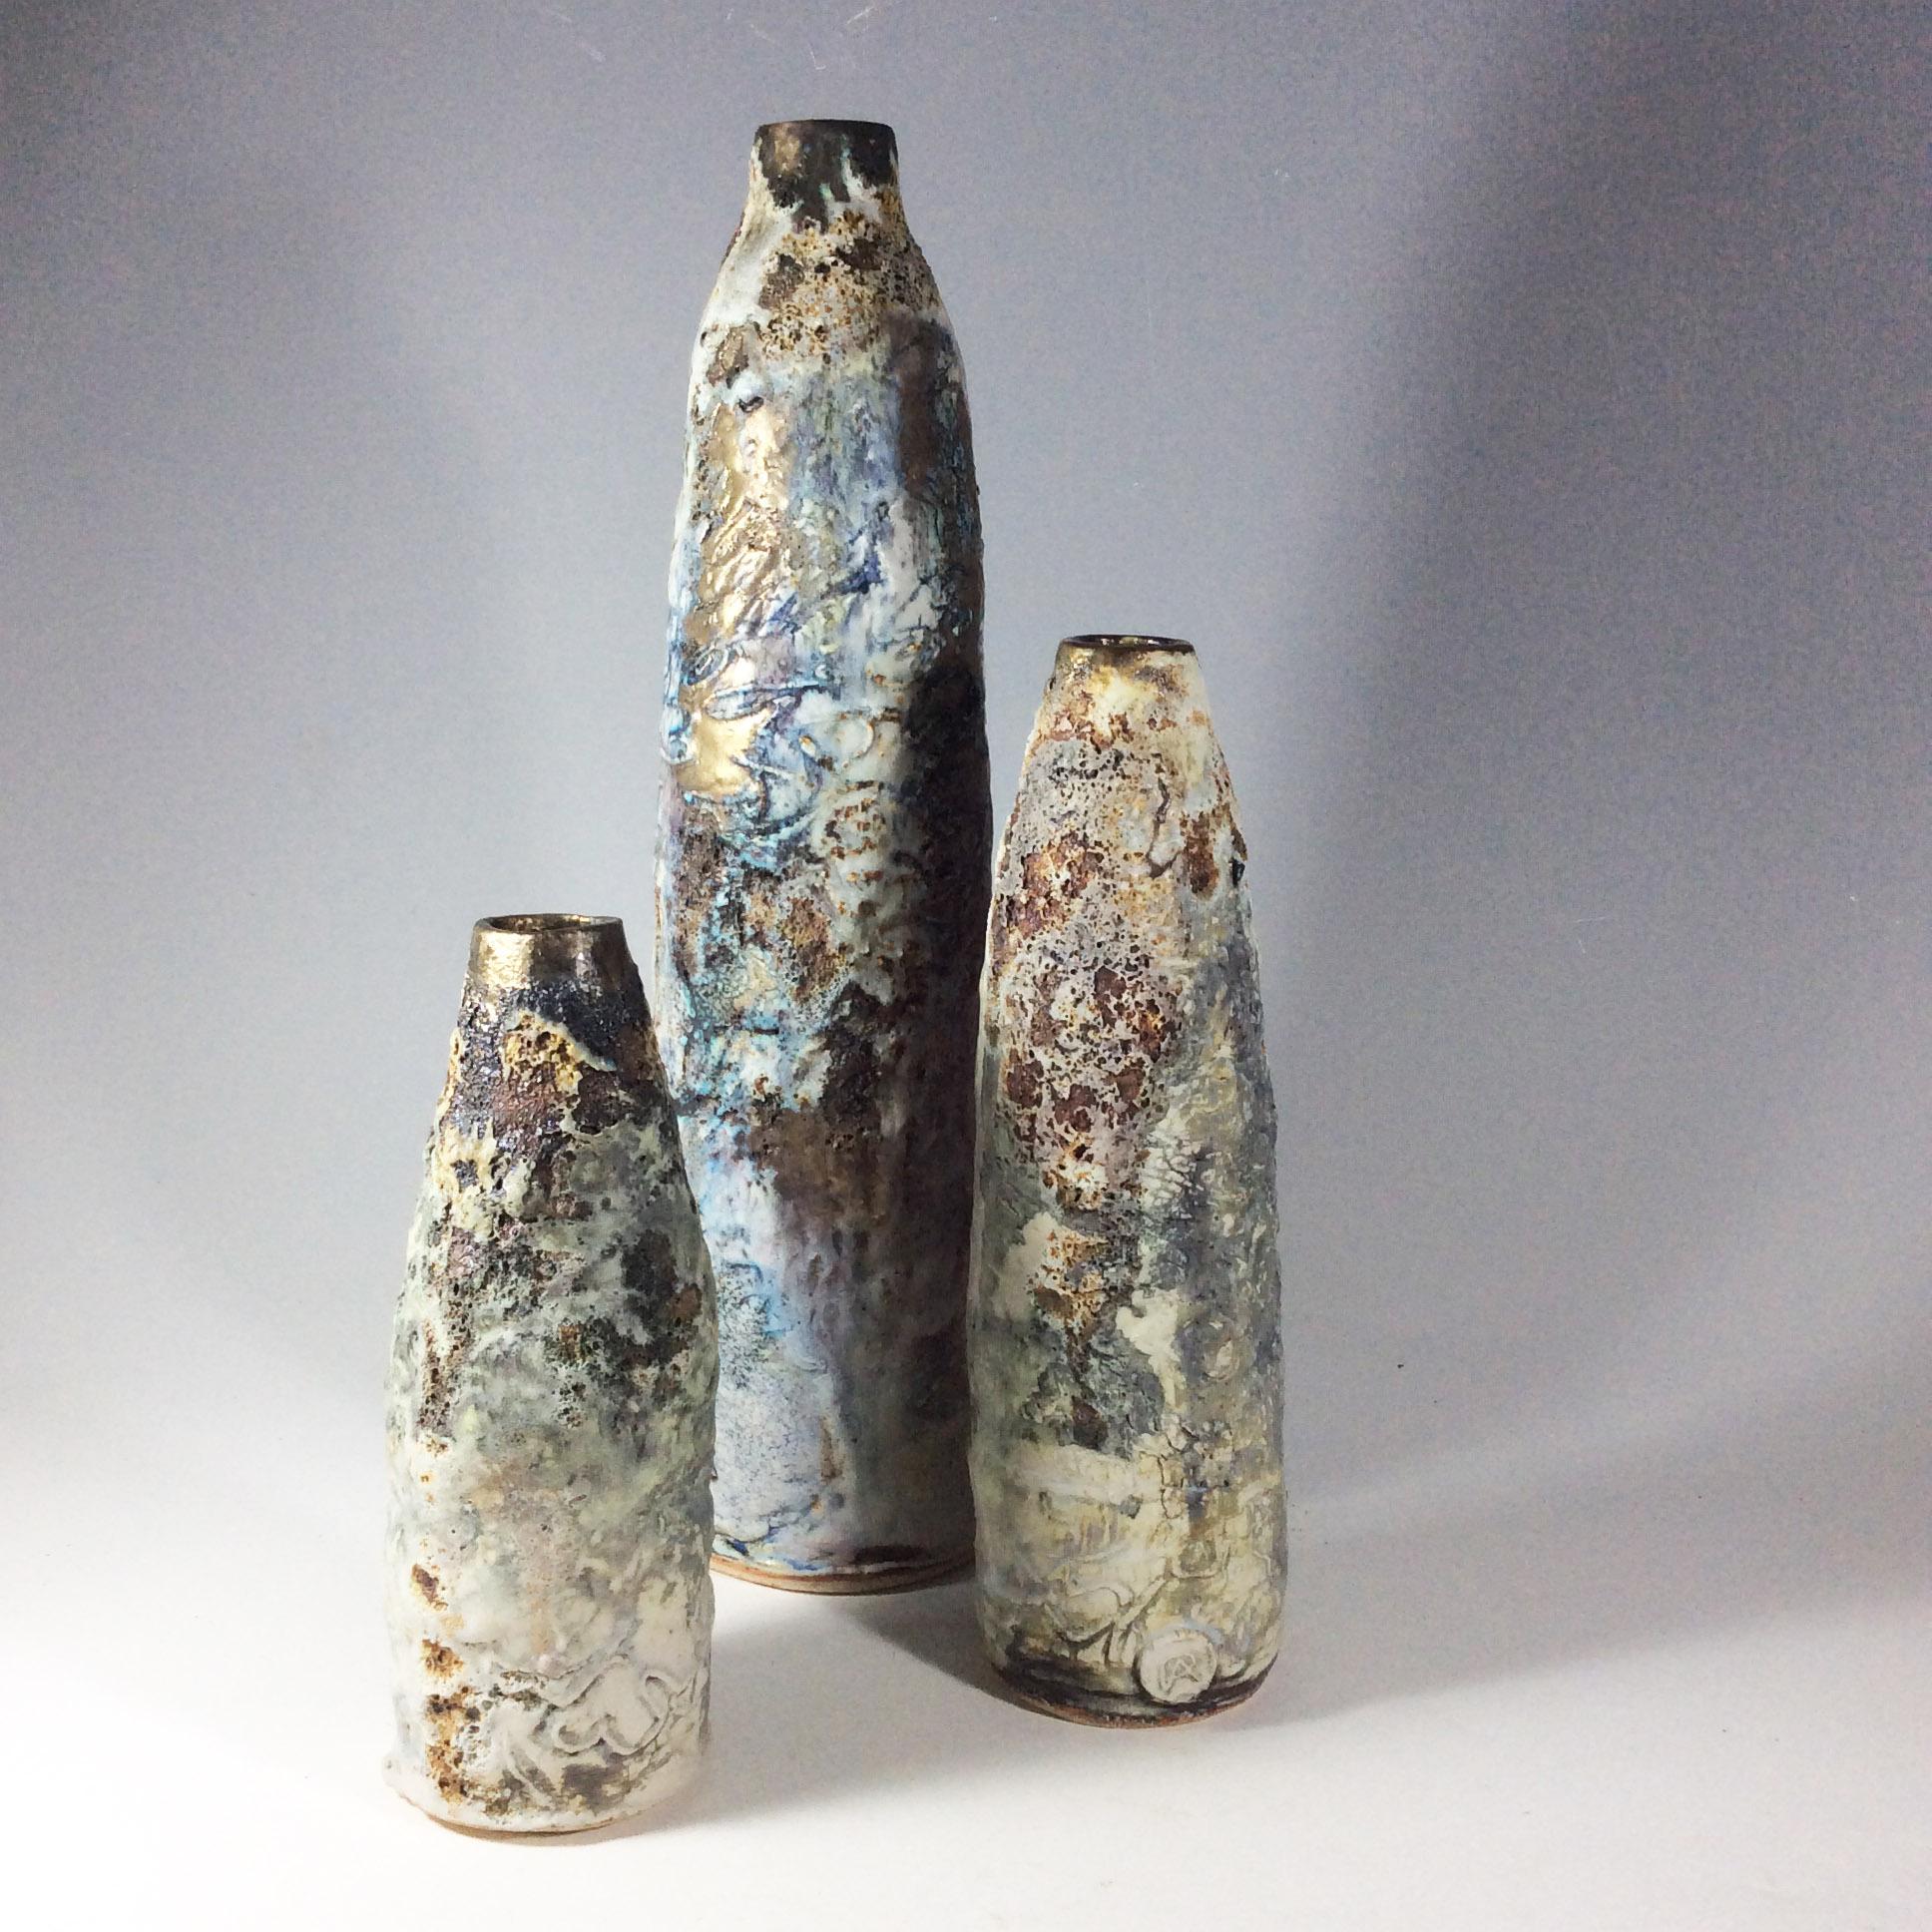 Adela Powell - Rock Water Bottles